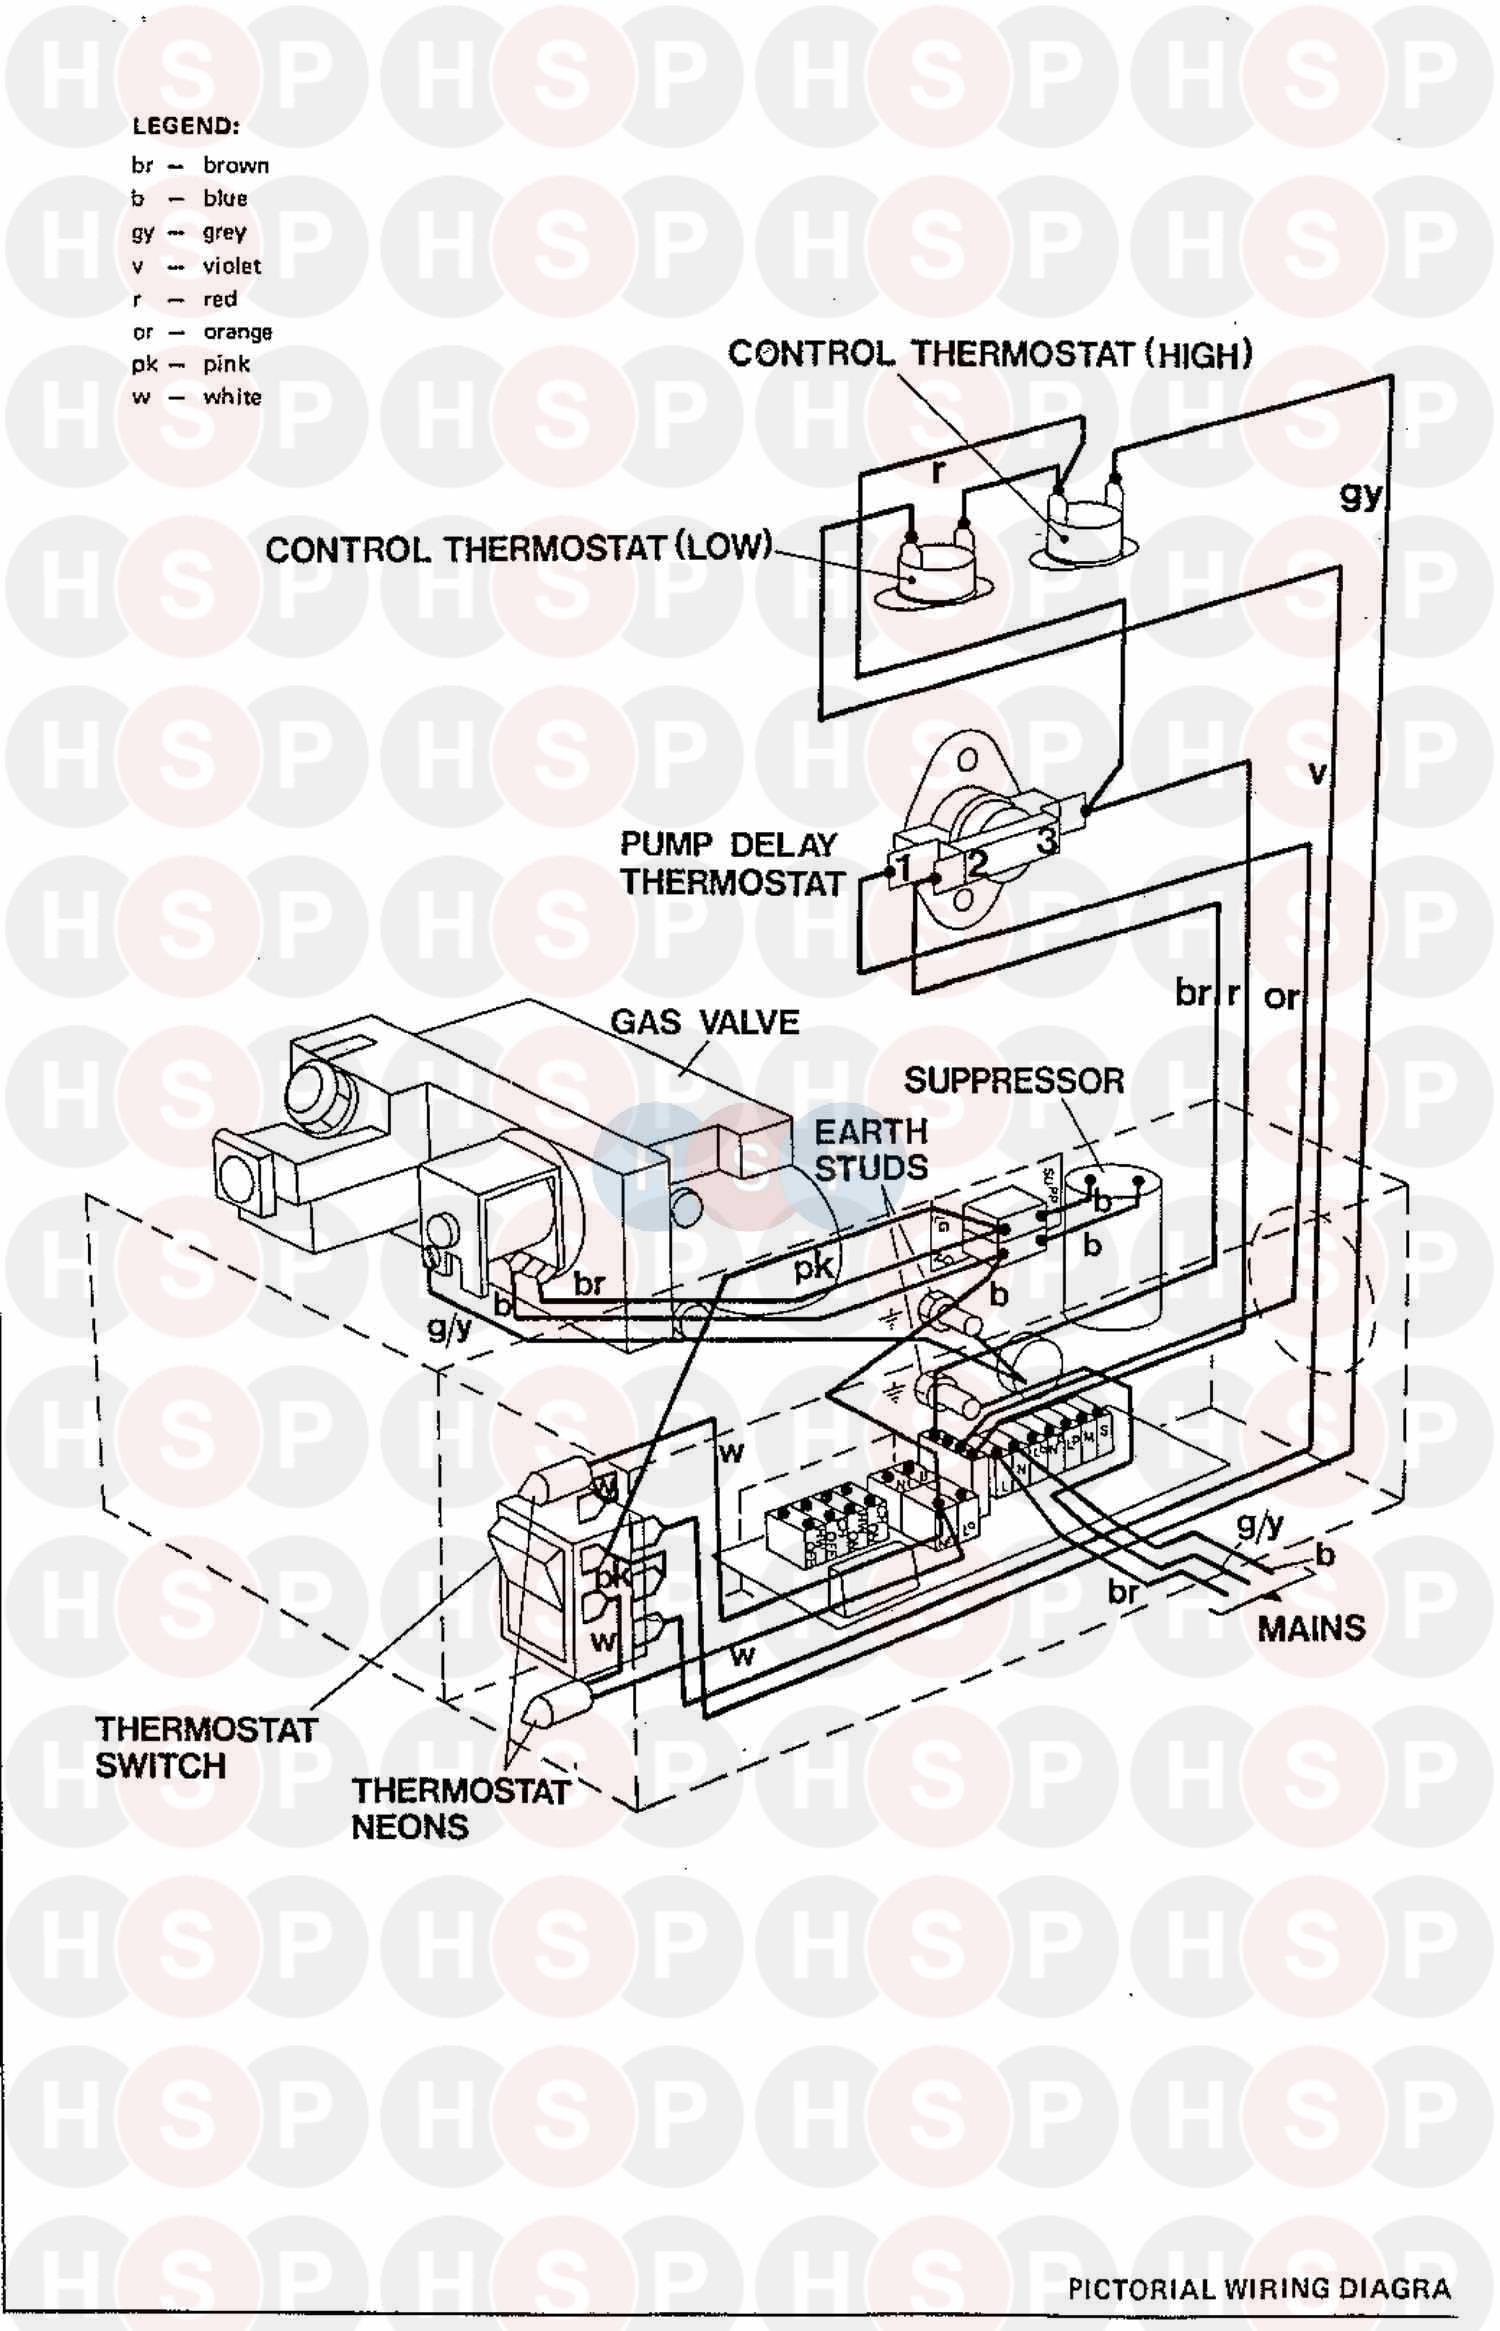 Ideal EXCEL CF 50 Appliance Diagram (Wiring Diagram 1